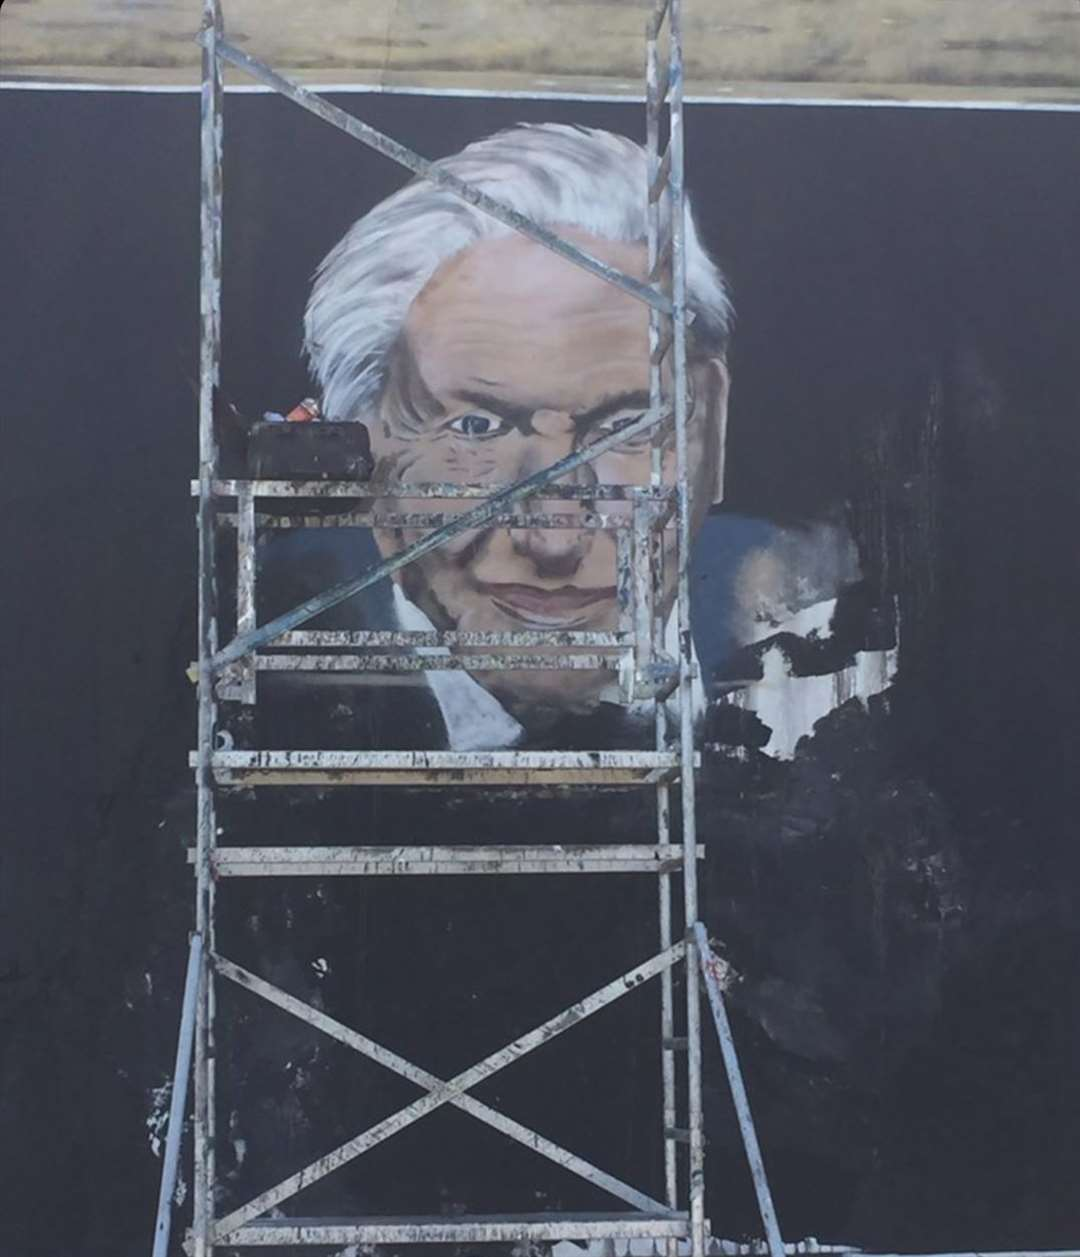 Graffiti artist Paddy Watts hopes Sir David Attenborough's mural will inspire beachgoers to treat the seaside with respect.  Image: @ pad303